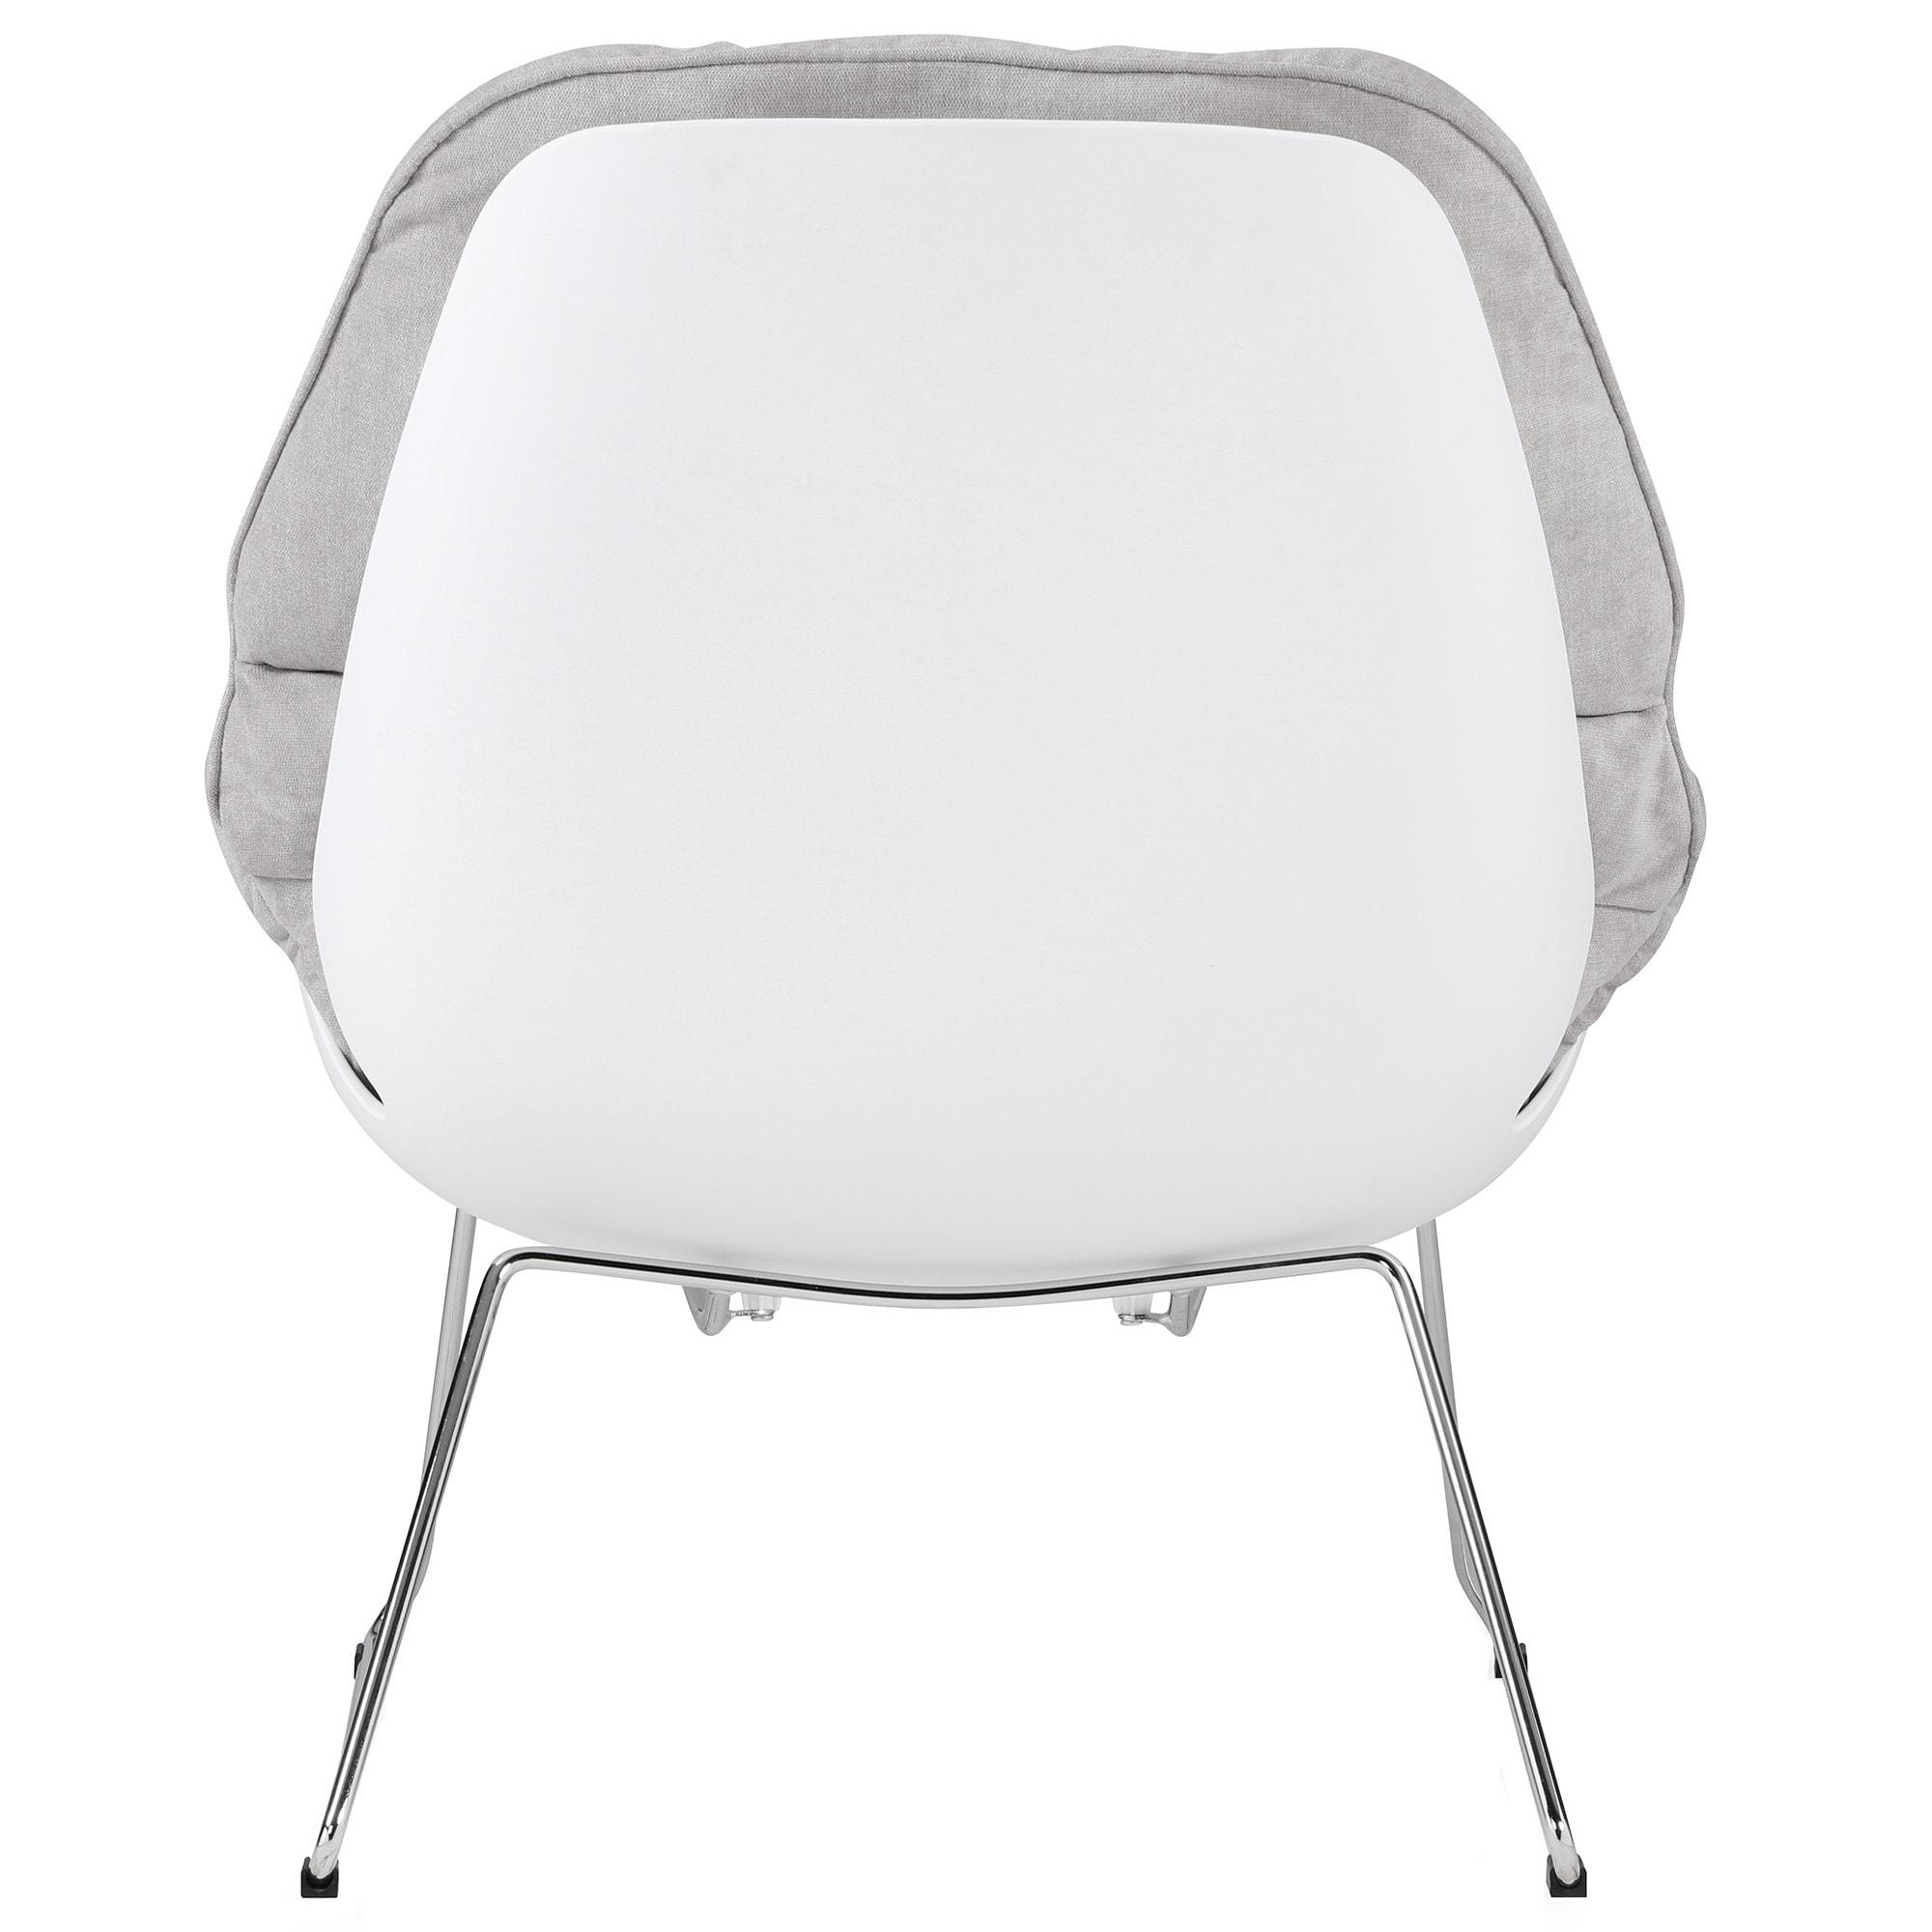 Fine Finn Accent Chair Charcoal Unemploymentrelief Wooden Chair Designs For Living Room Unemploymentrelieforg